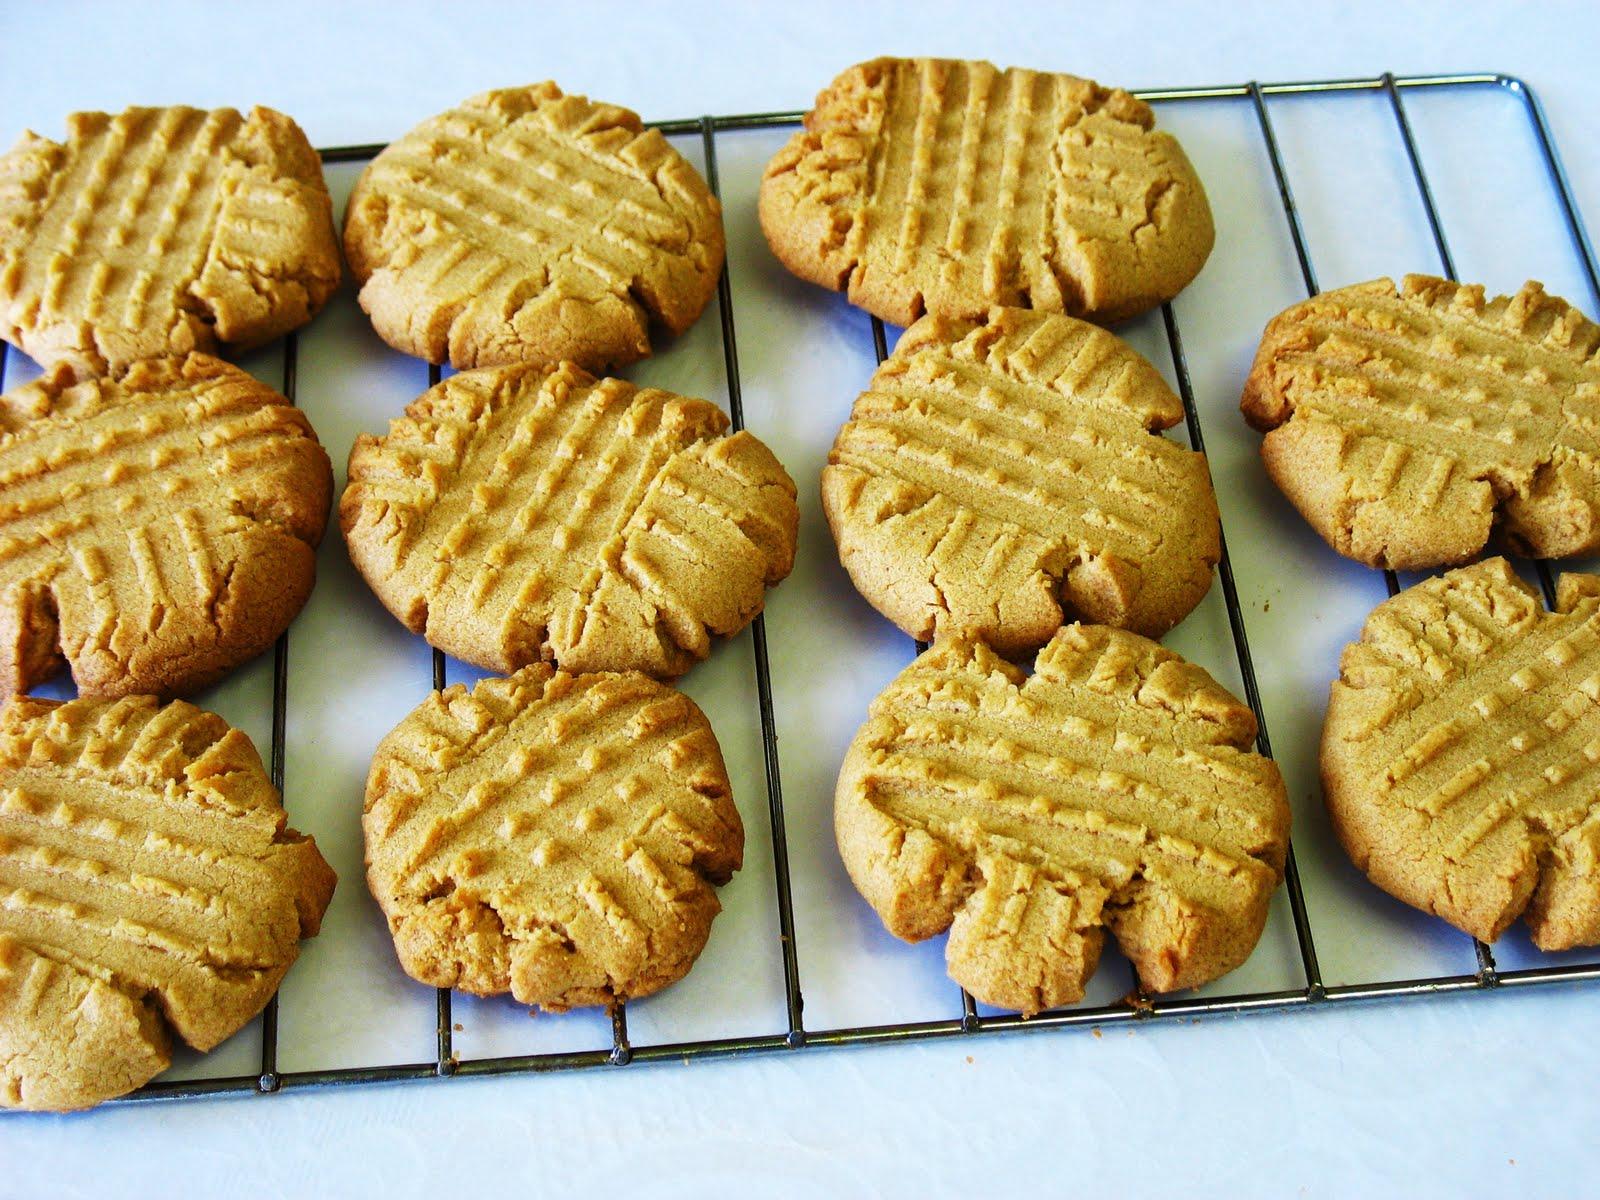 The Gluten Free Spouse: Gluten Free Peanut Butter Cookies